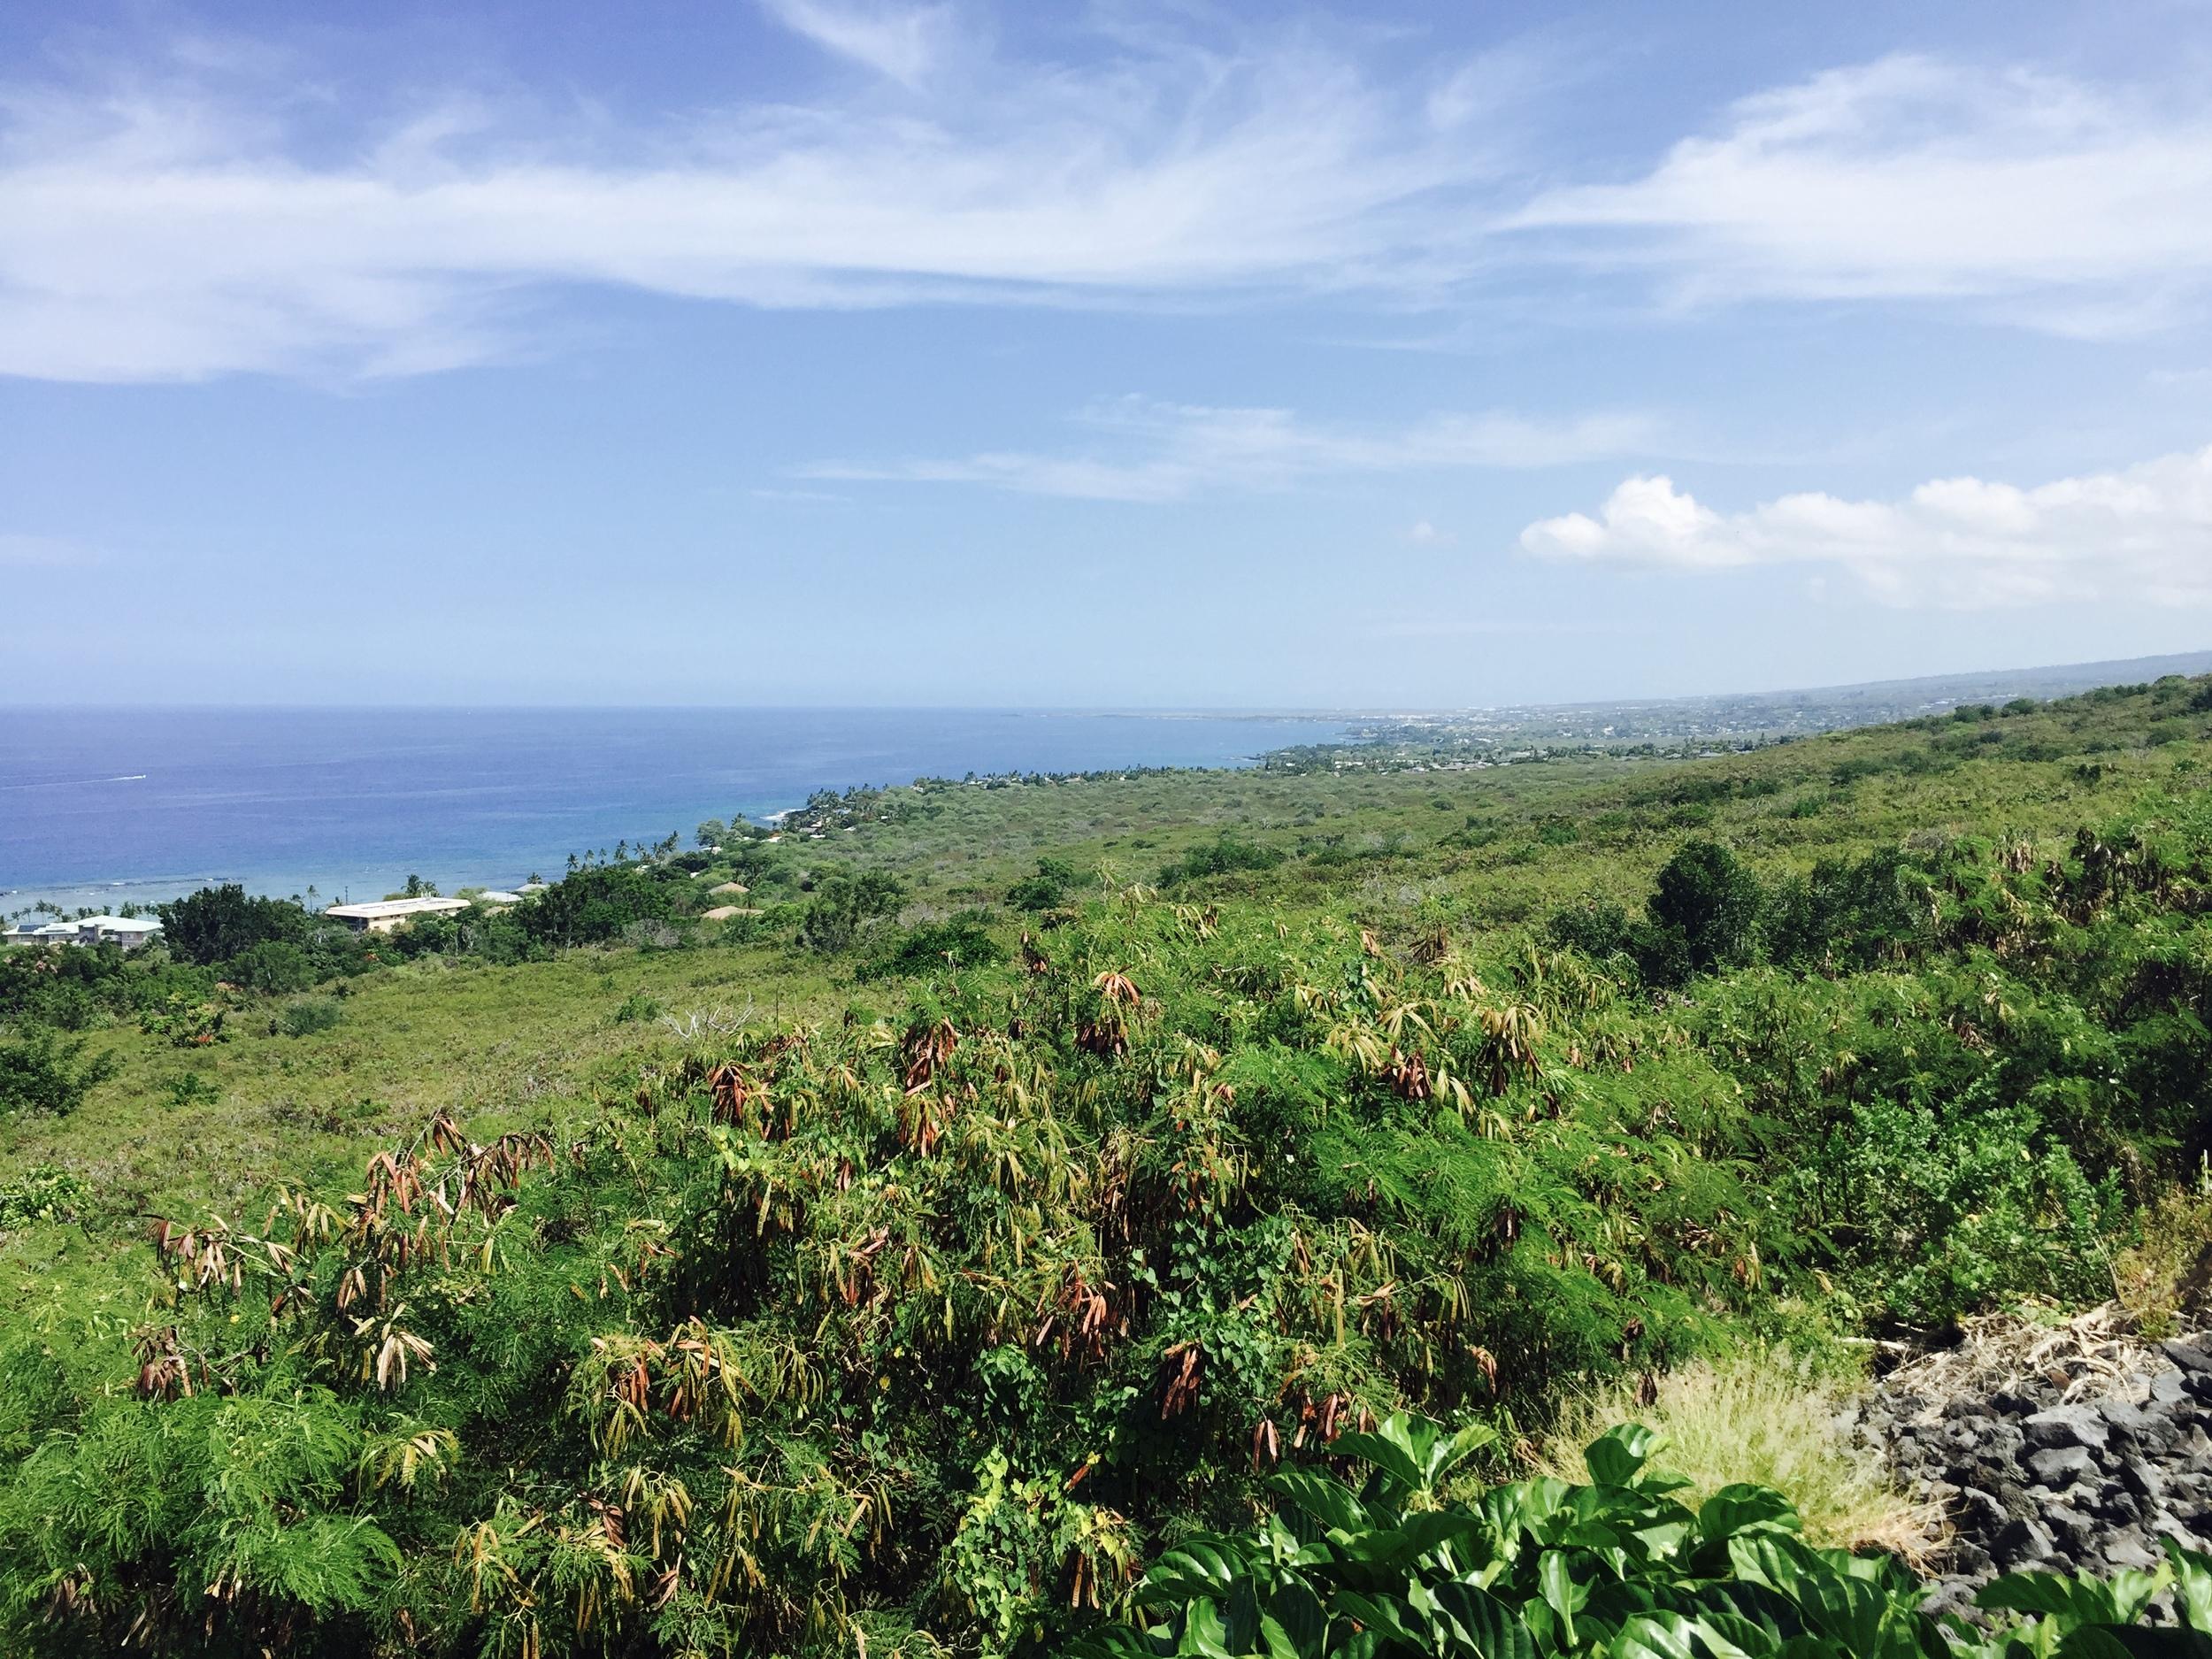 Views of Kailua-Kona